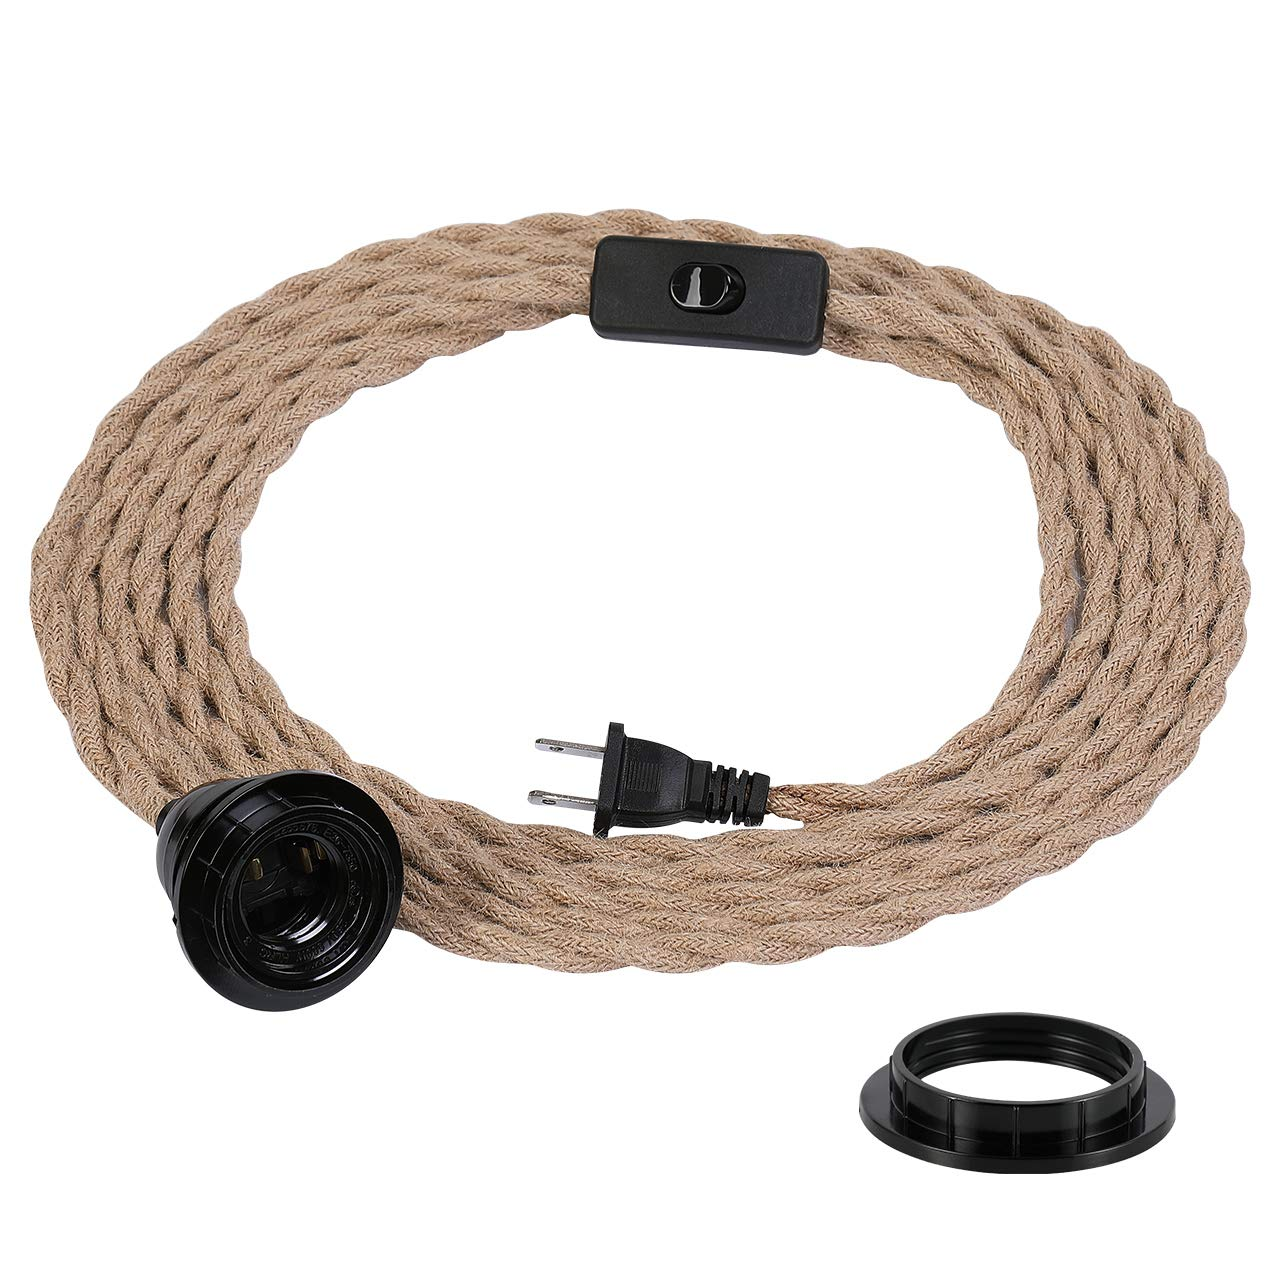 ZOOSSI Pendant Light Cord, Hanging Light Kit with Switch Plug in, 15FT Hemp Rope Cord Hang Lamp, Industrial Vintage Pendant Light Socket Set E26 E27, Pendant Lamp Farmhouse, Retro Lamp Cable DIY